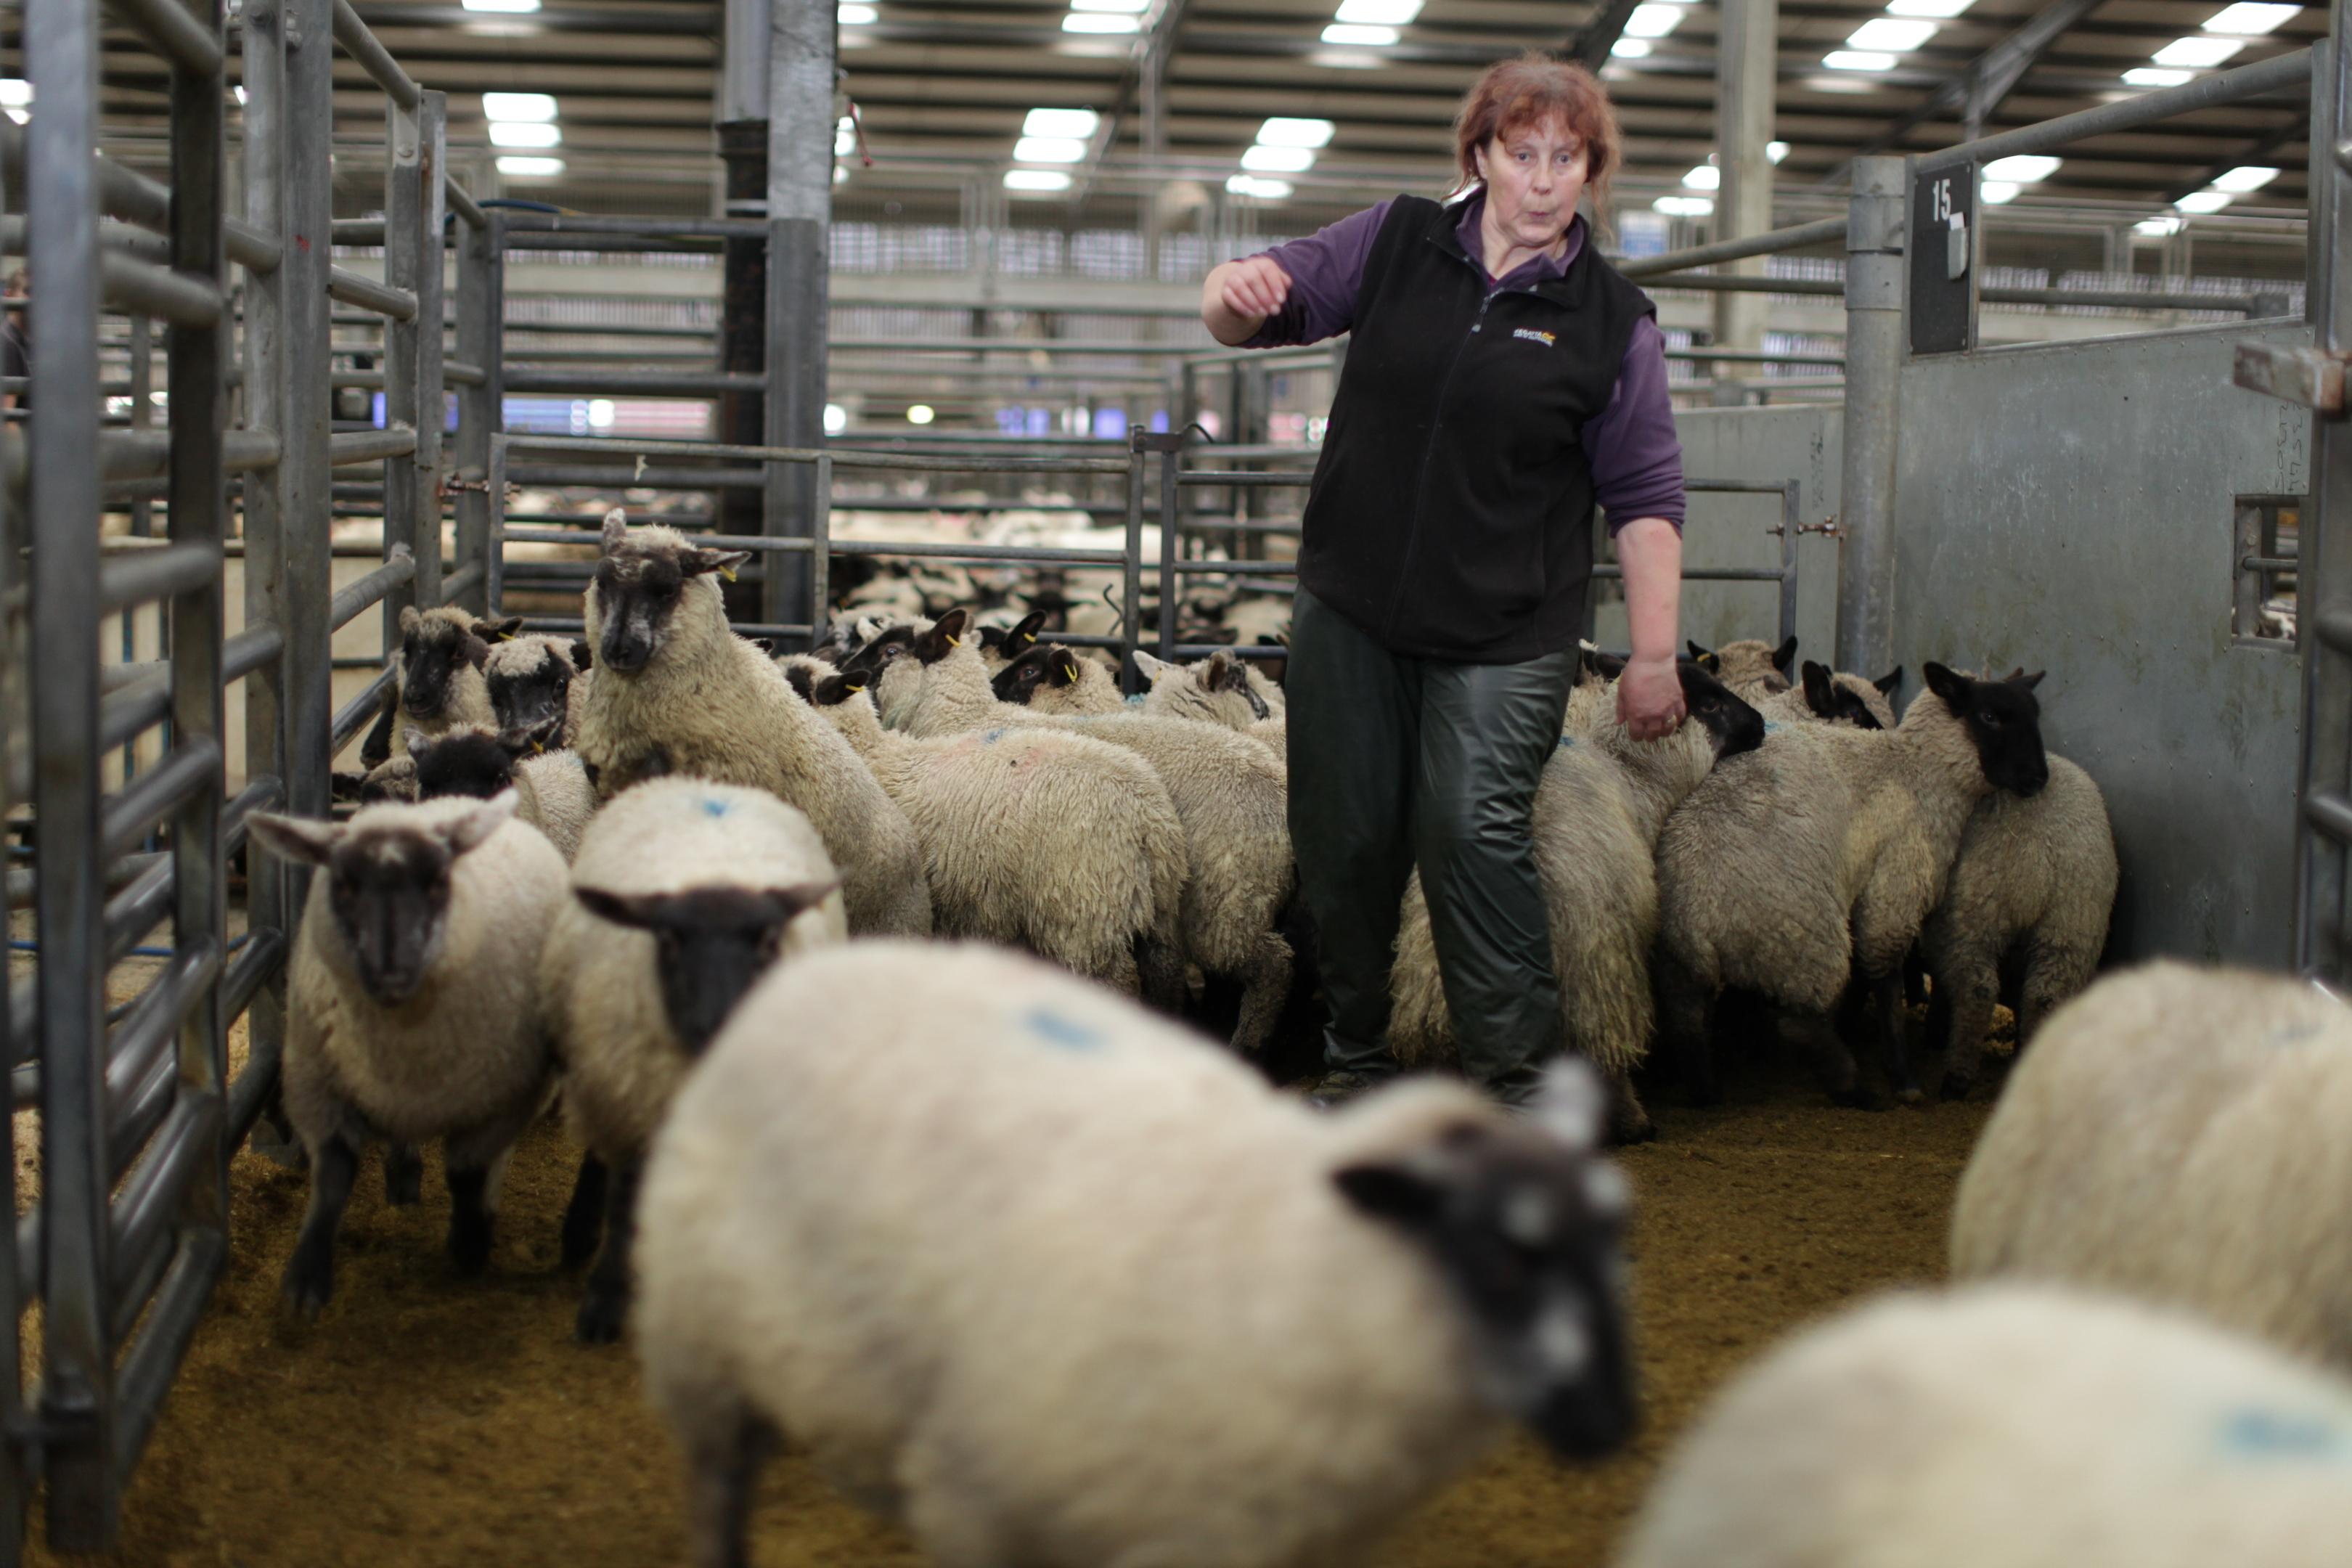 Livestock seller Jacqueline Strathdee